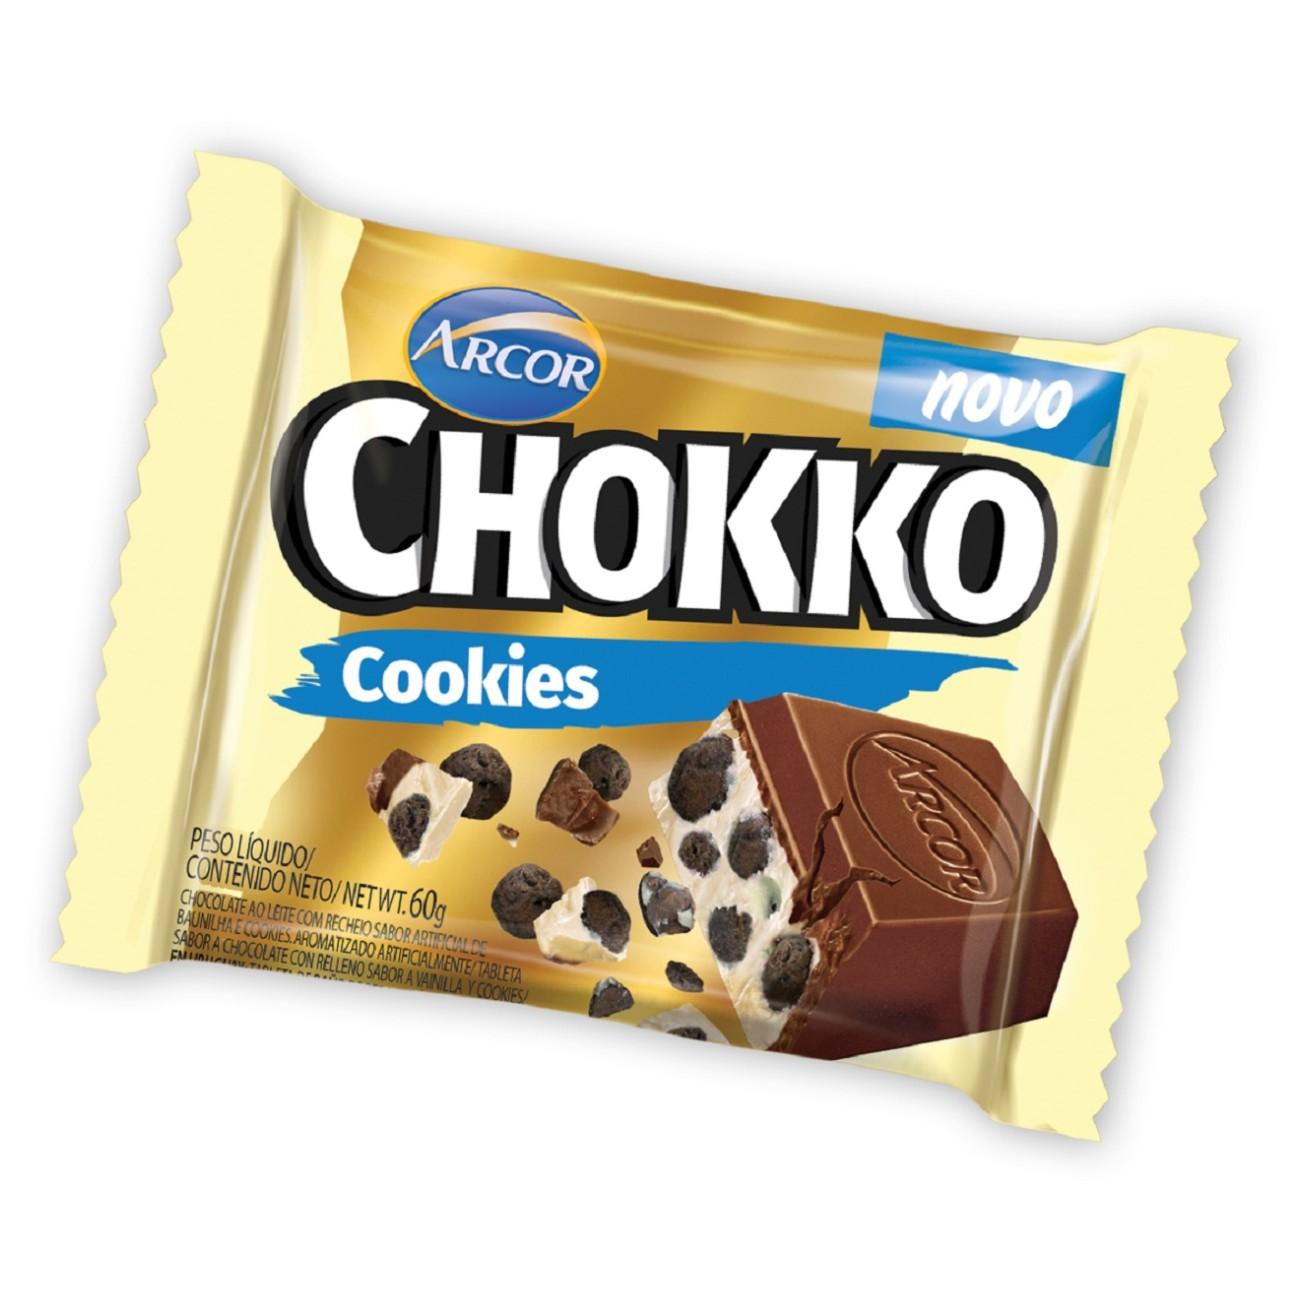 Display de Tablete de Chocolate Chokko com Cookies 60g (12 un/cada)